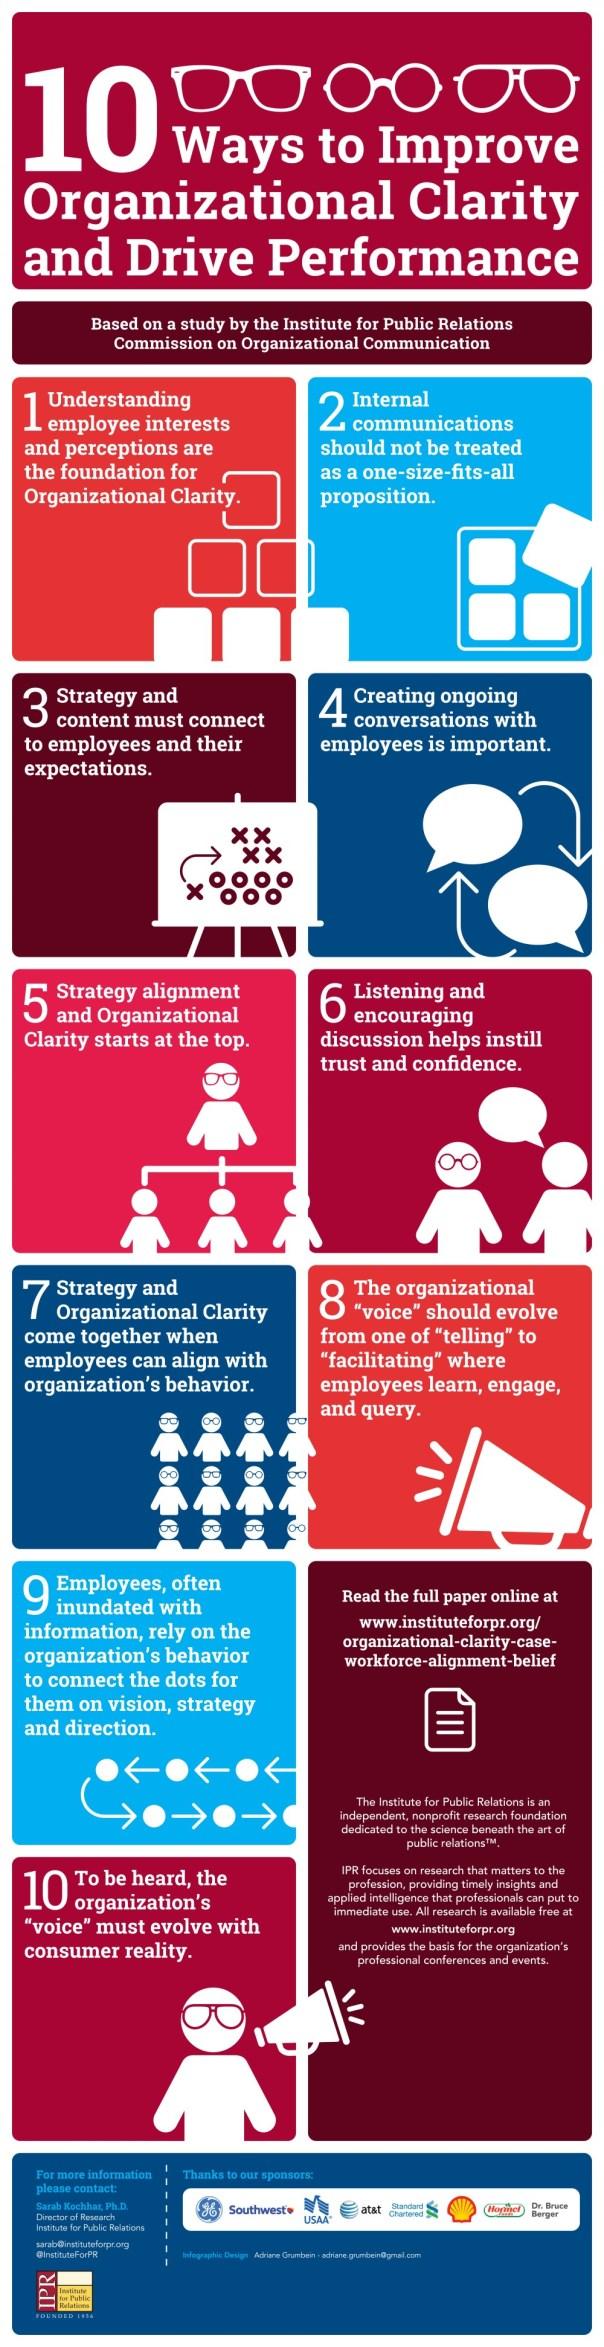 Organizational Clarity - Infographic 2 - 05-16-16